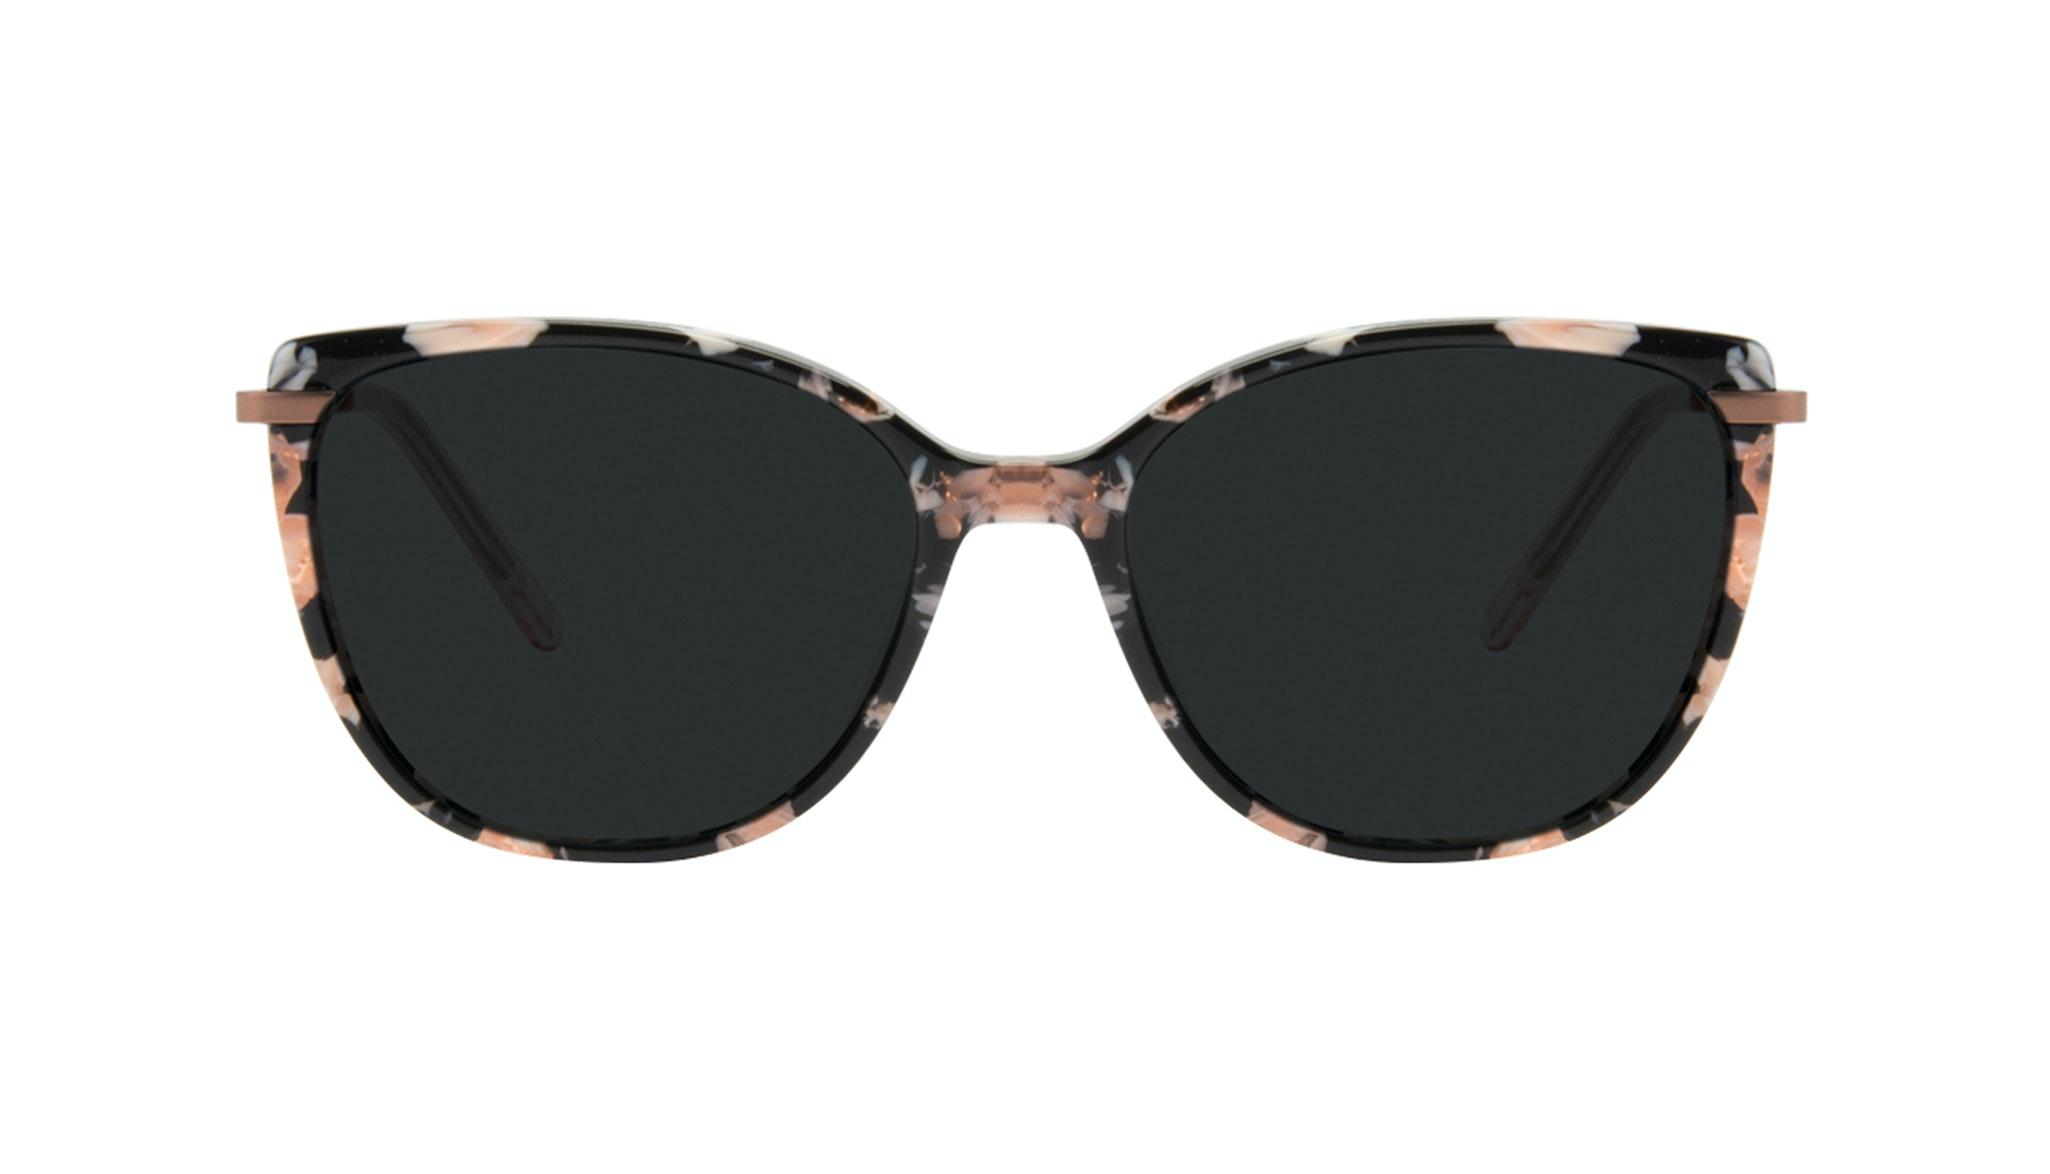 Affordable Fashion Glasses Cat Eye Rectangle Square Sunglasses Women Illusion Licorice Front